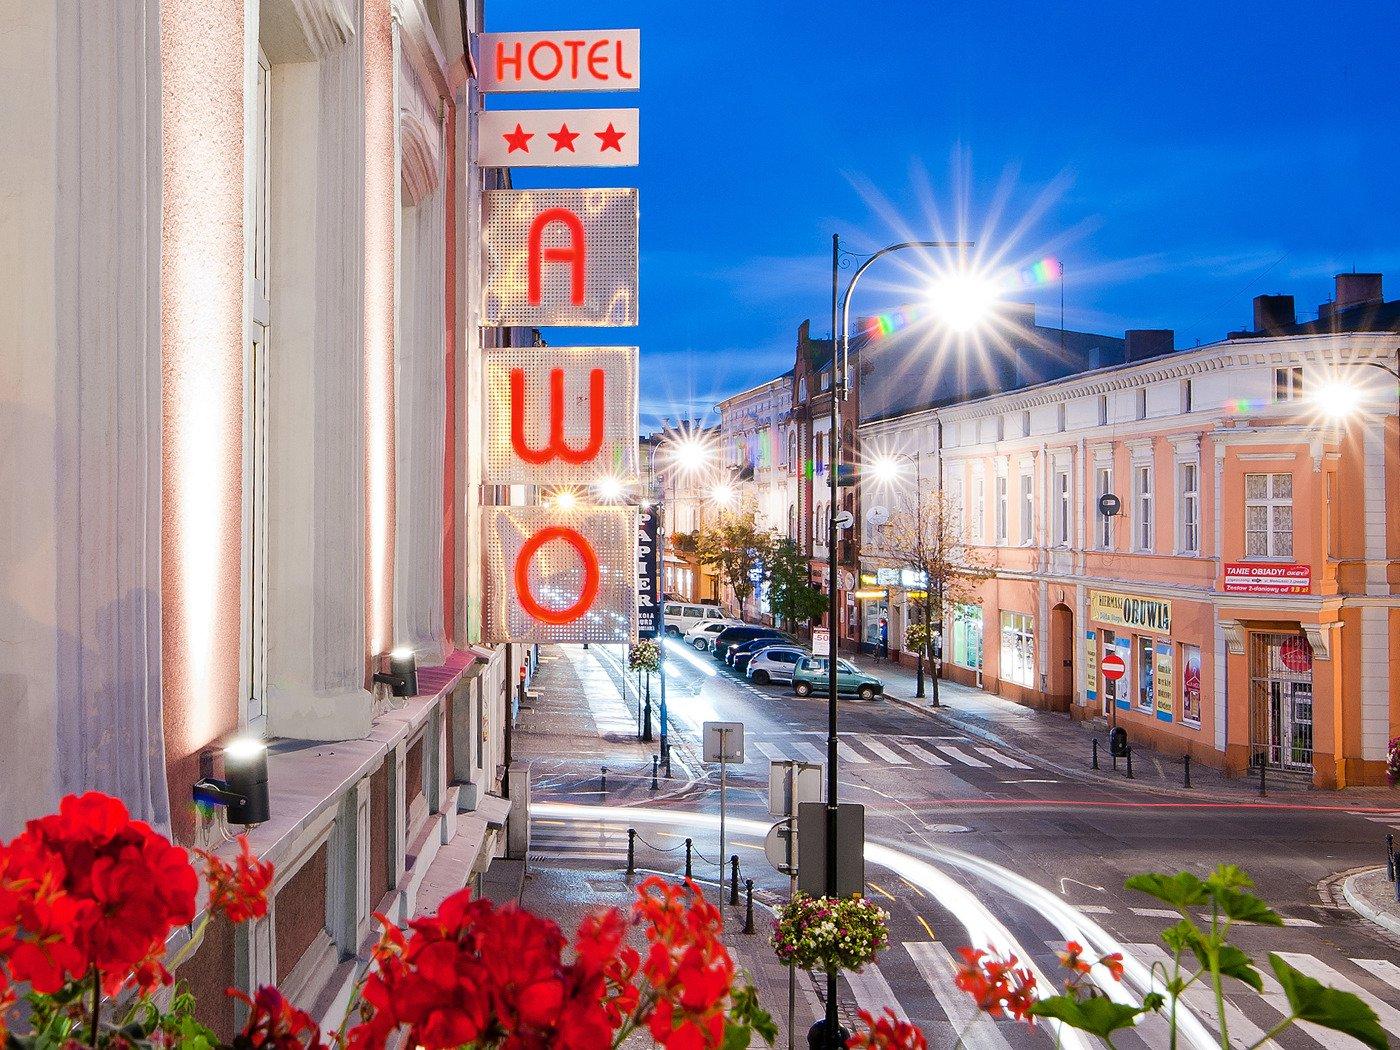 Hotel Awo